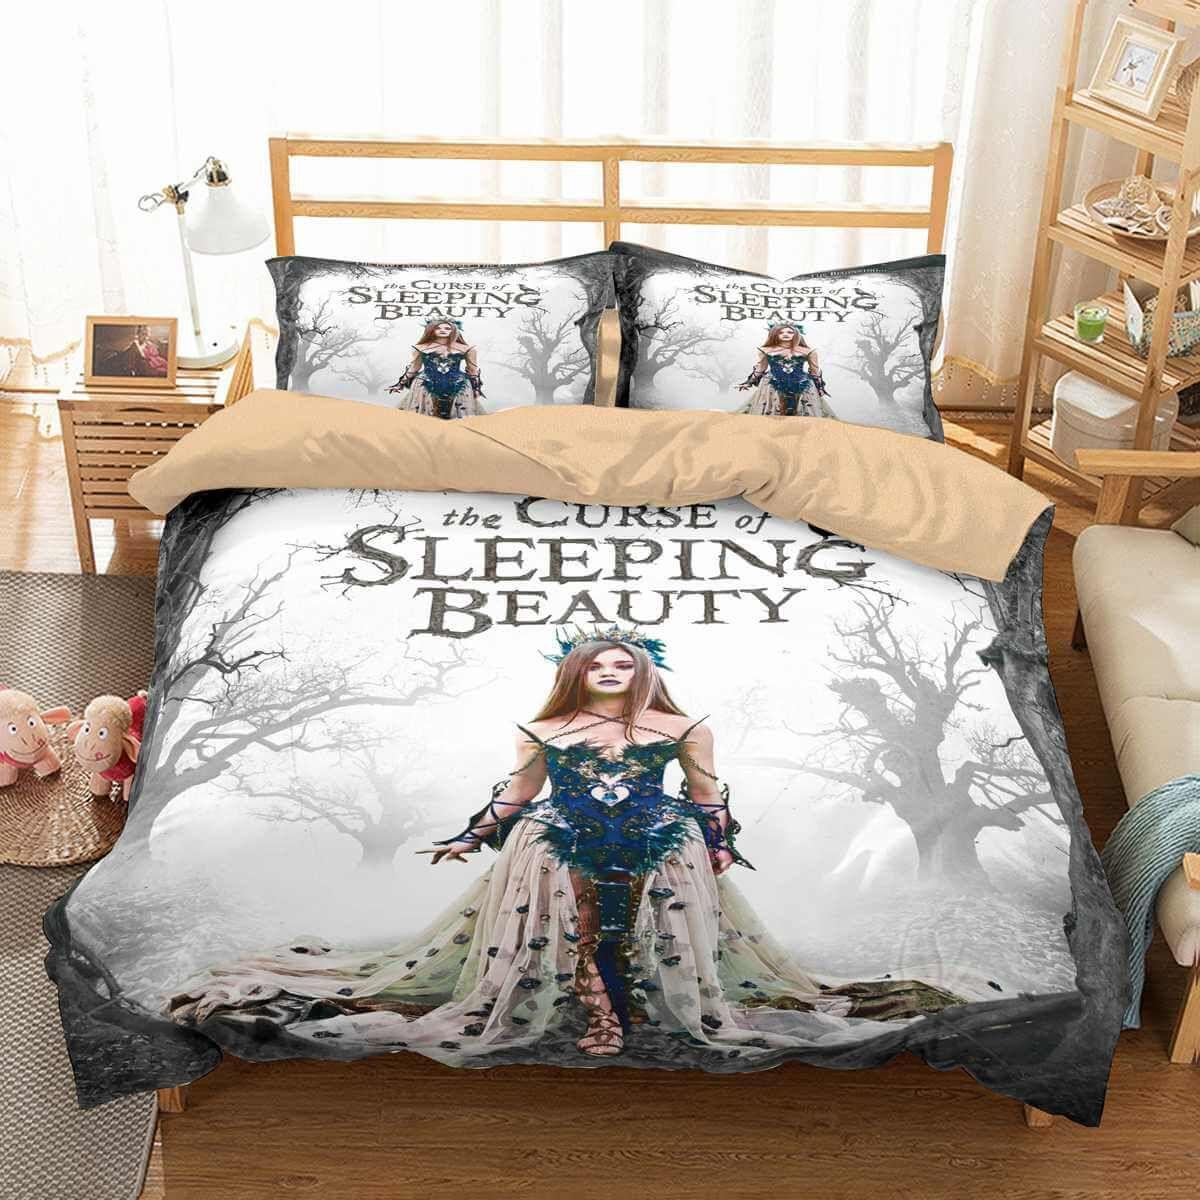 3d Customize The Curse Of Sleeping Beauty Bedding Set Duvet Cover Set Bedroom Set Bedlinen Duvet Bedding Sets Duvet Cover Sets Customised Bed Bedroom set genshin impact